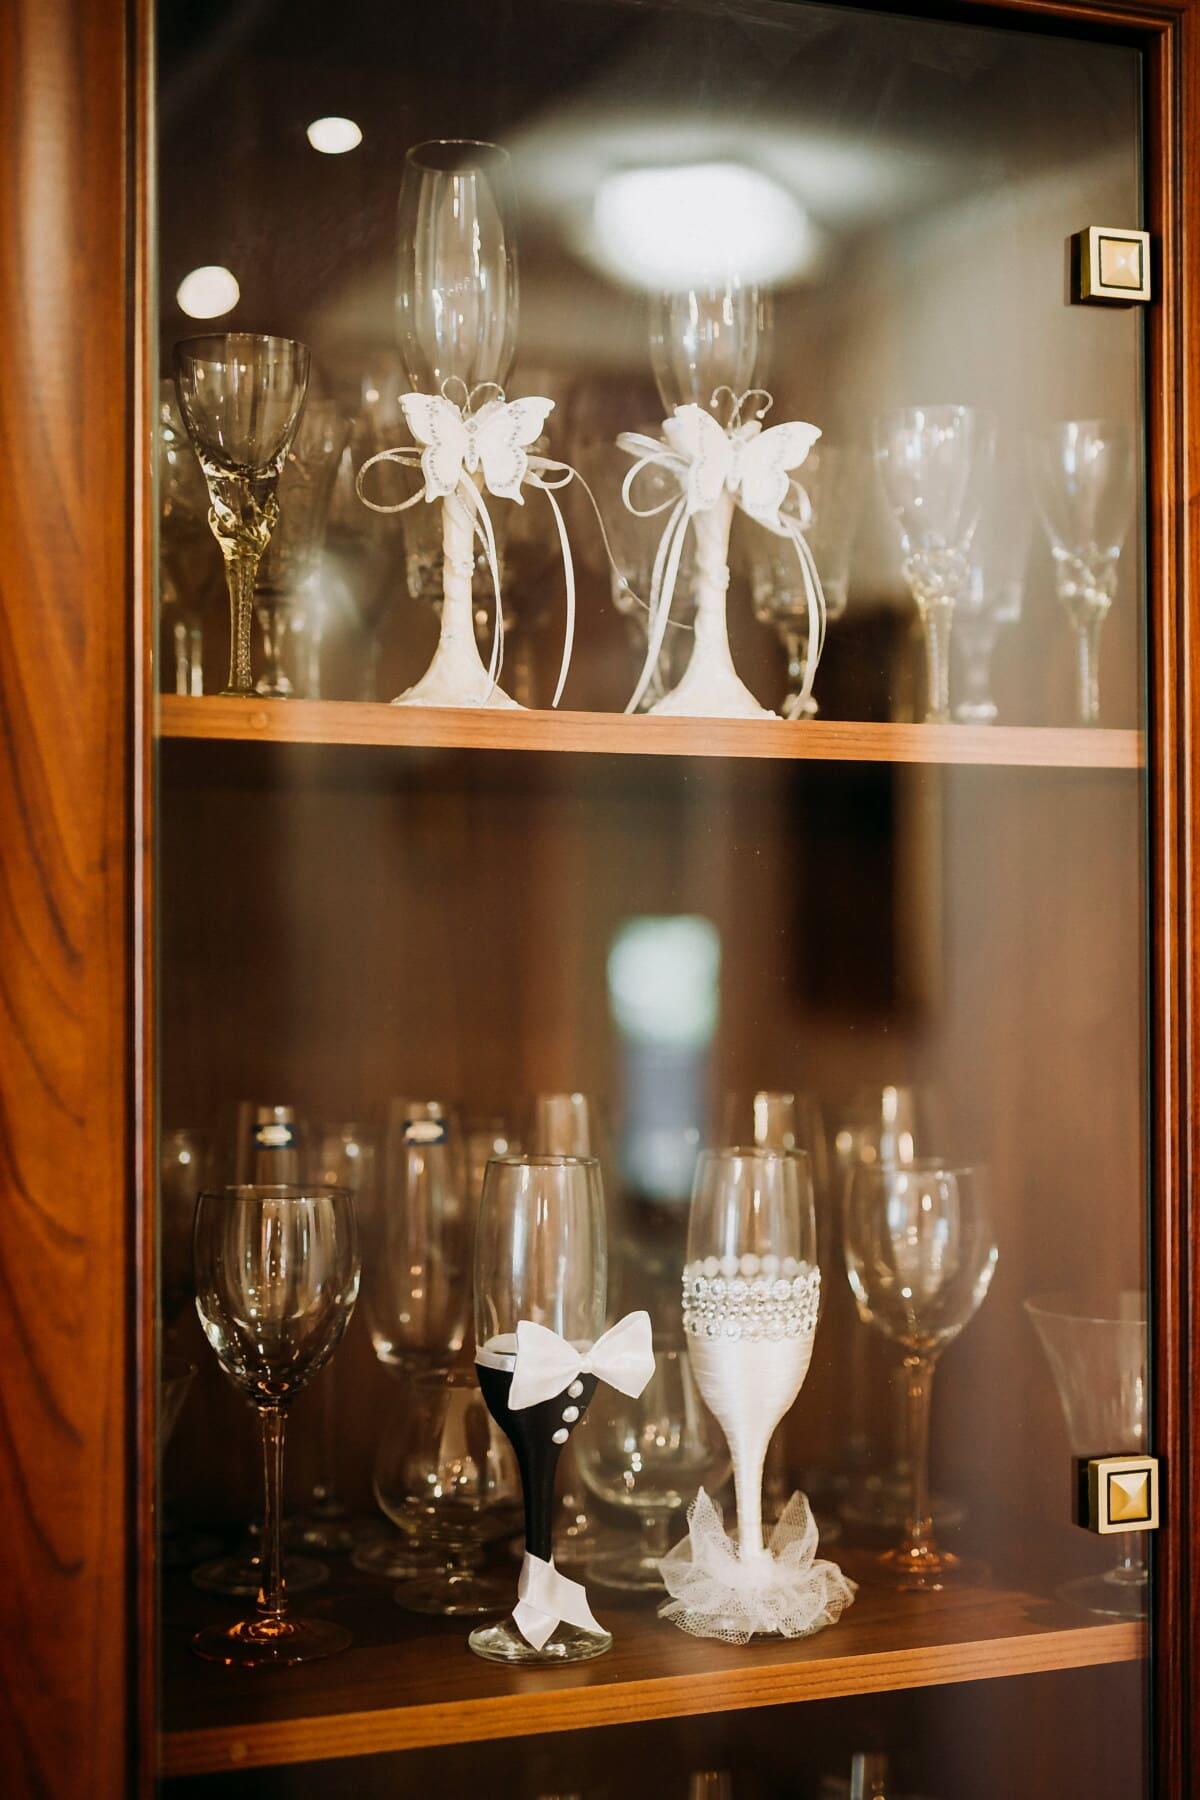 crystal, glassware, shelf, furniture, celebration, glass, luxury, interior design, indoors, elegant